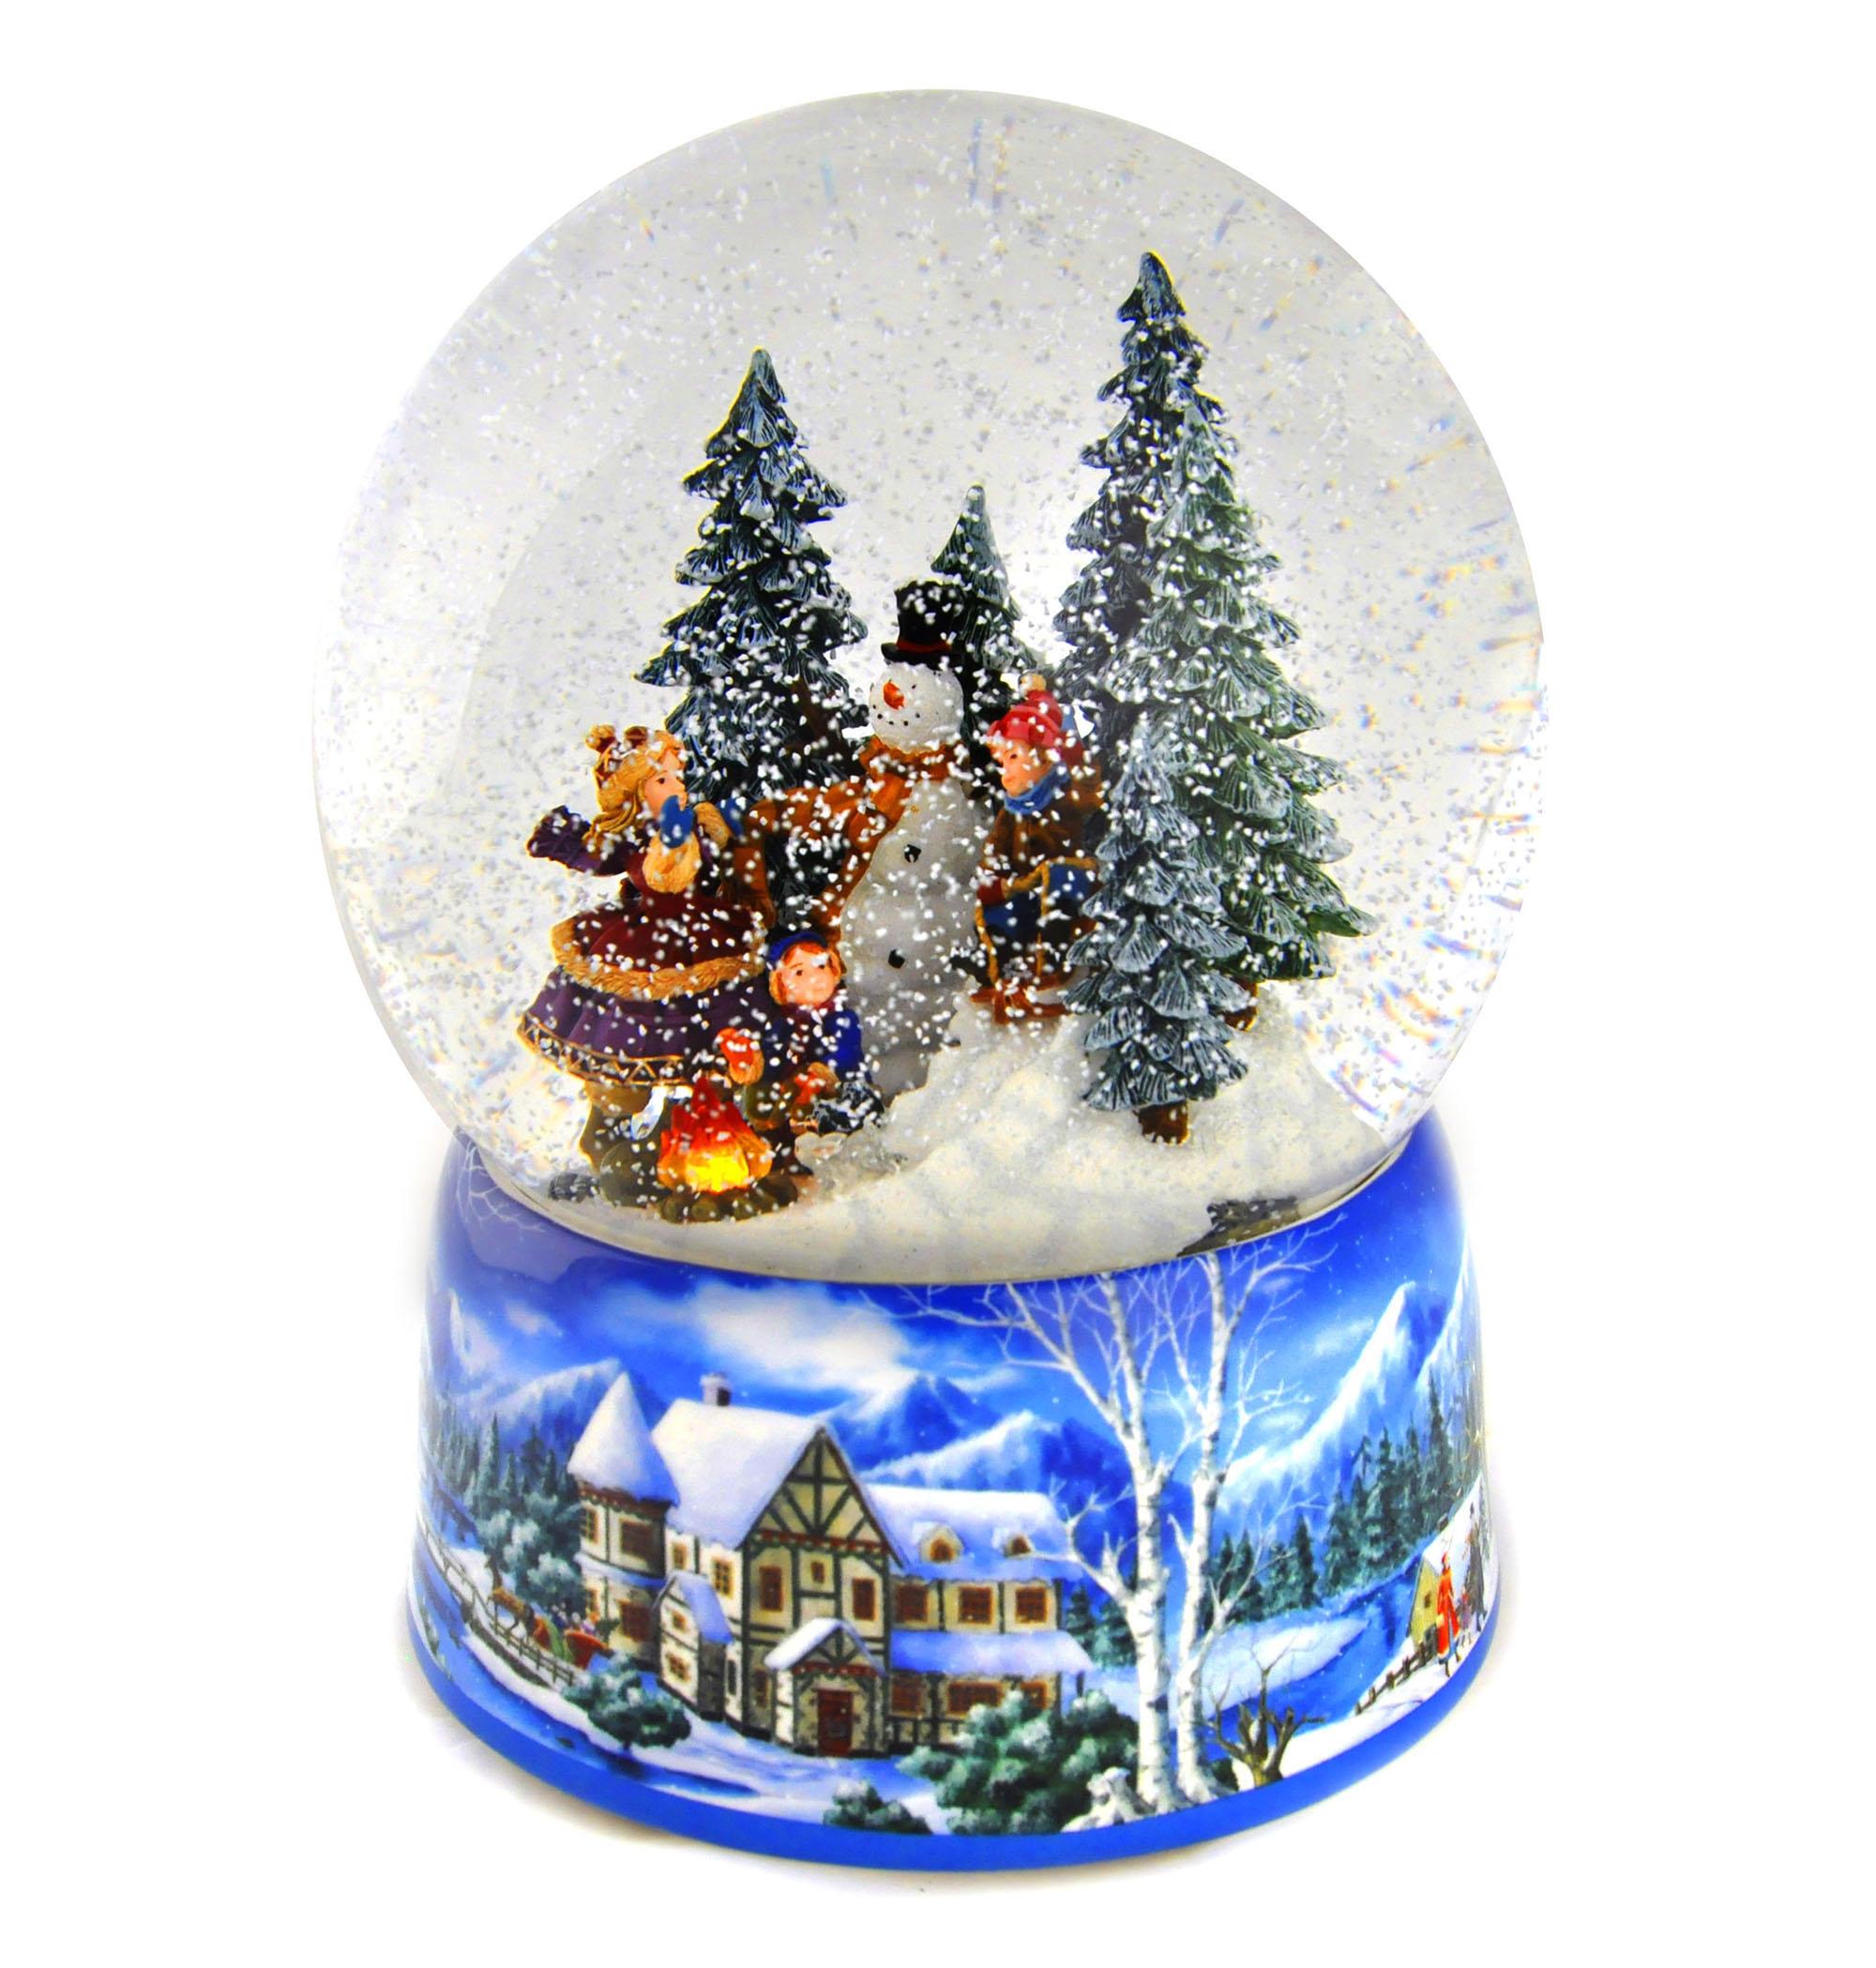 Let it Snow' Light up musical Christmas Snowstorm Globe   Pink Cat Shop